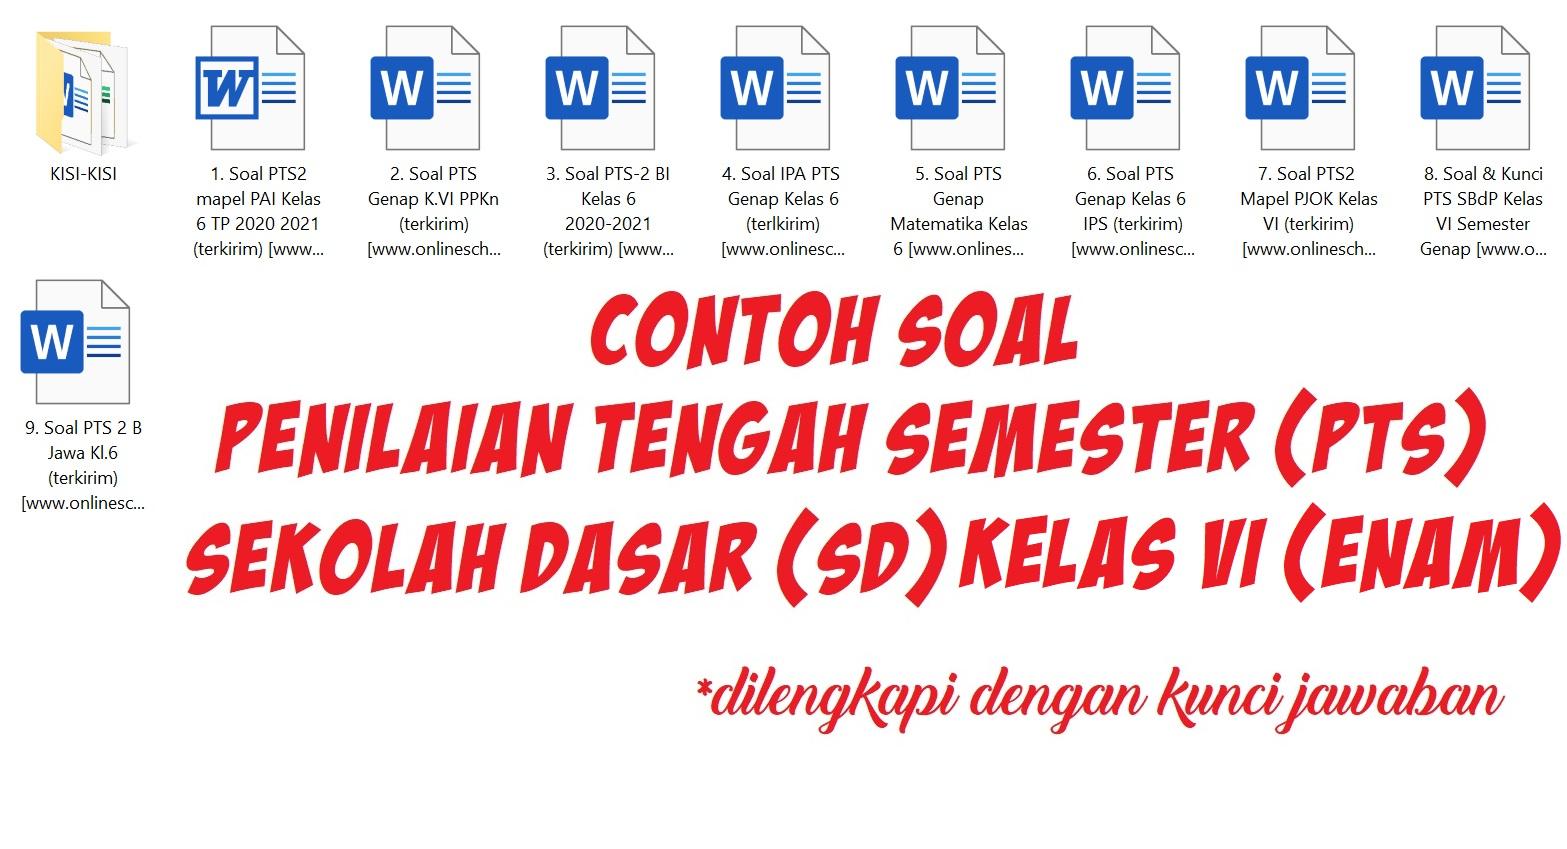 Contoh Soal Penilaian Tengah Semester (PTS) Sekolah Dasar (SD) Kelas VI (Enam)